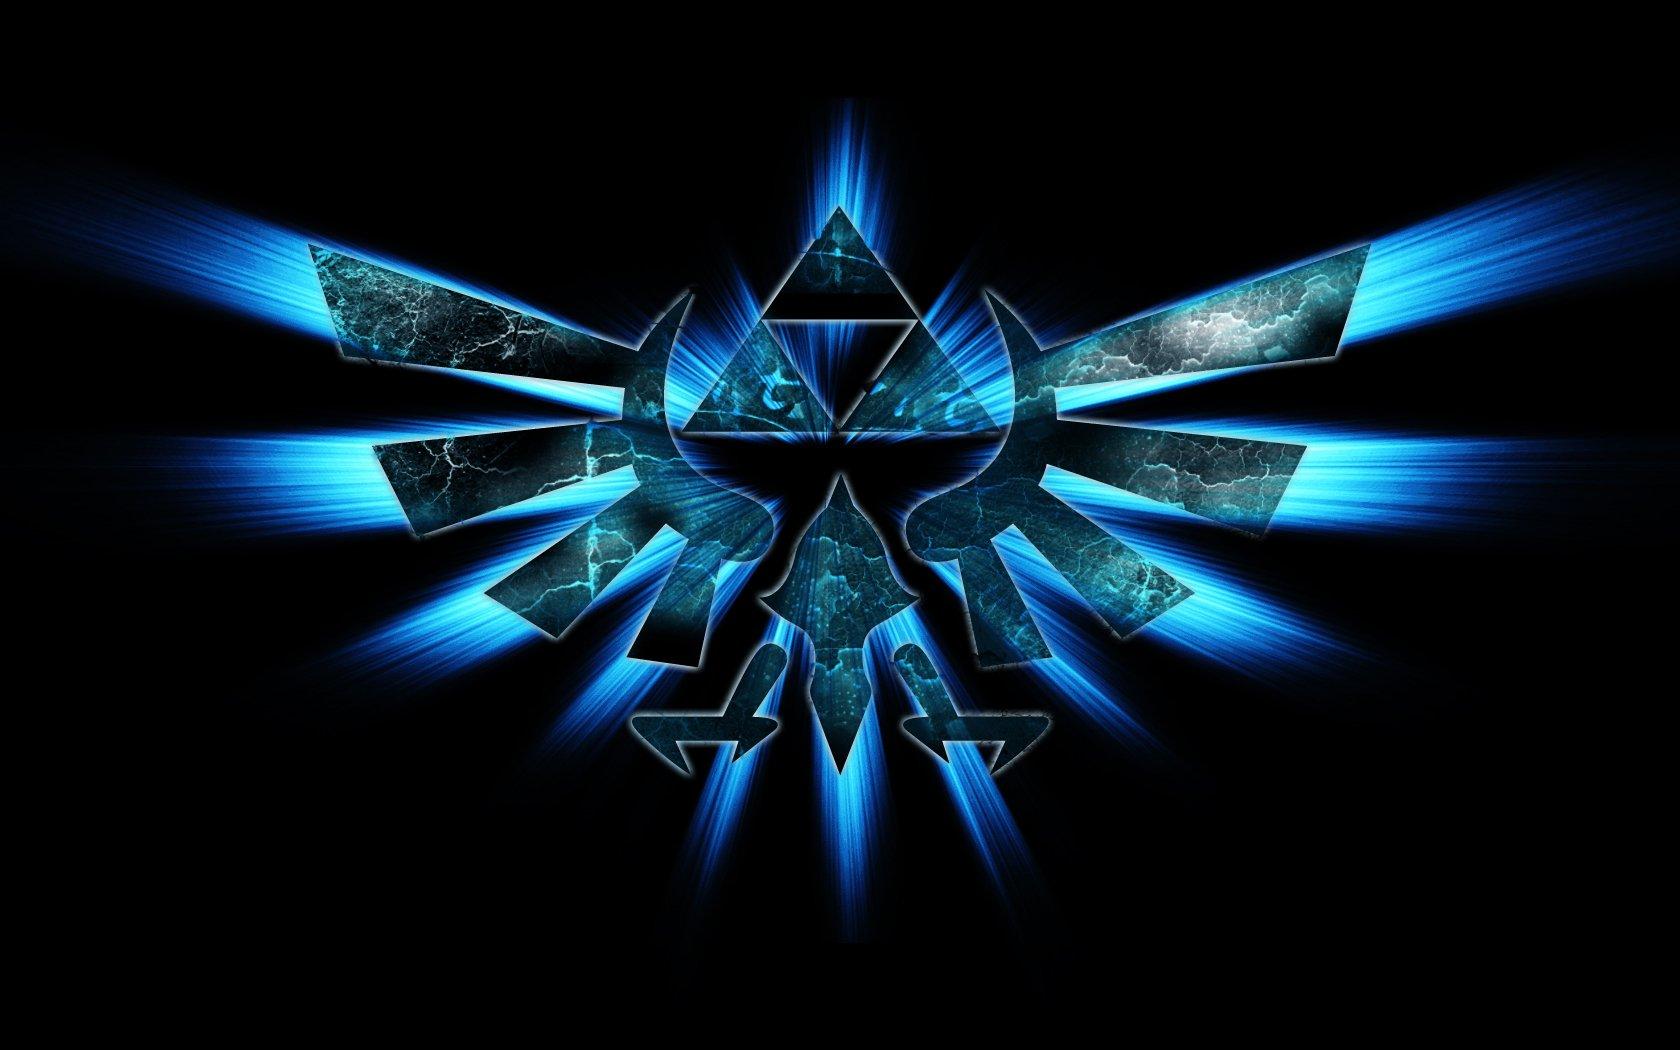 375 Zelda HD Wallpapers | Backgrounds - Wallpaper Abyss